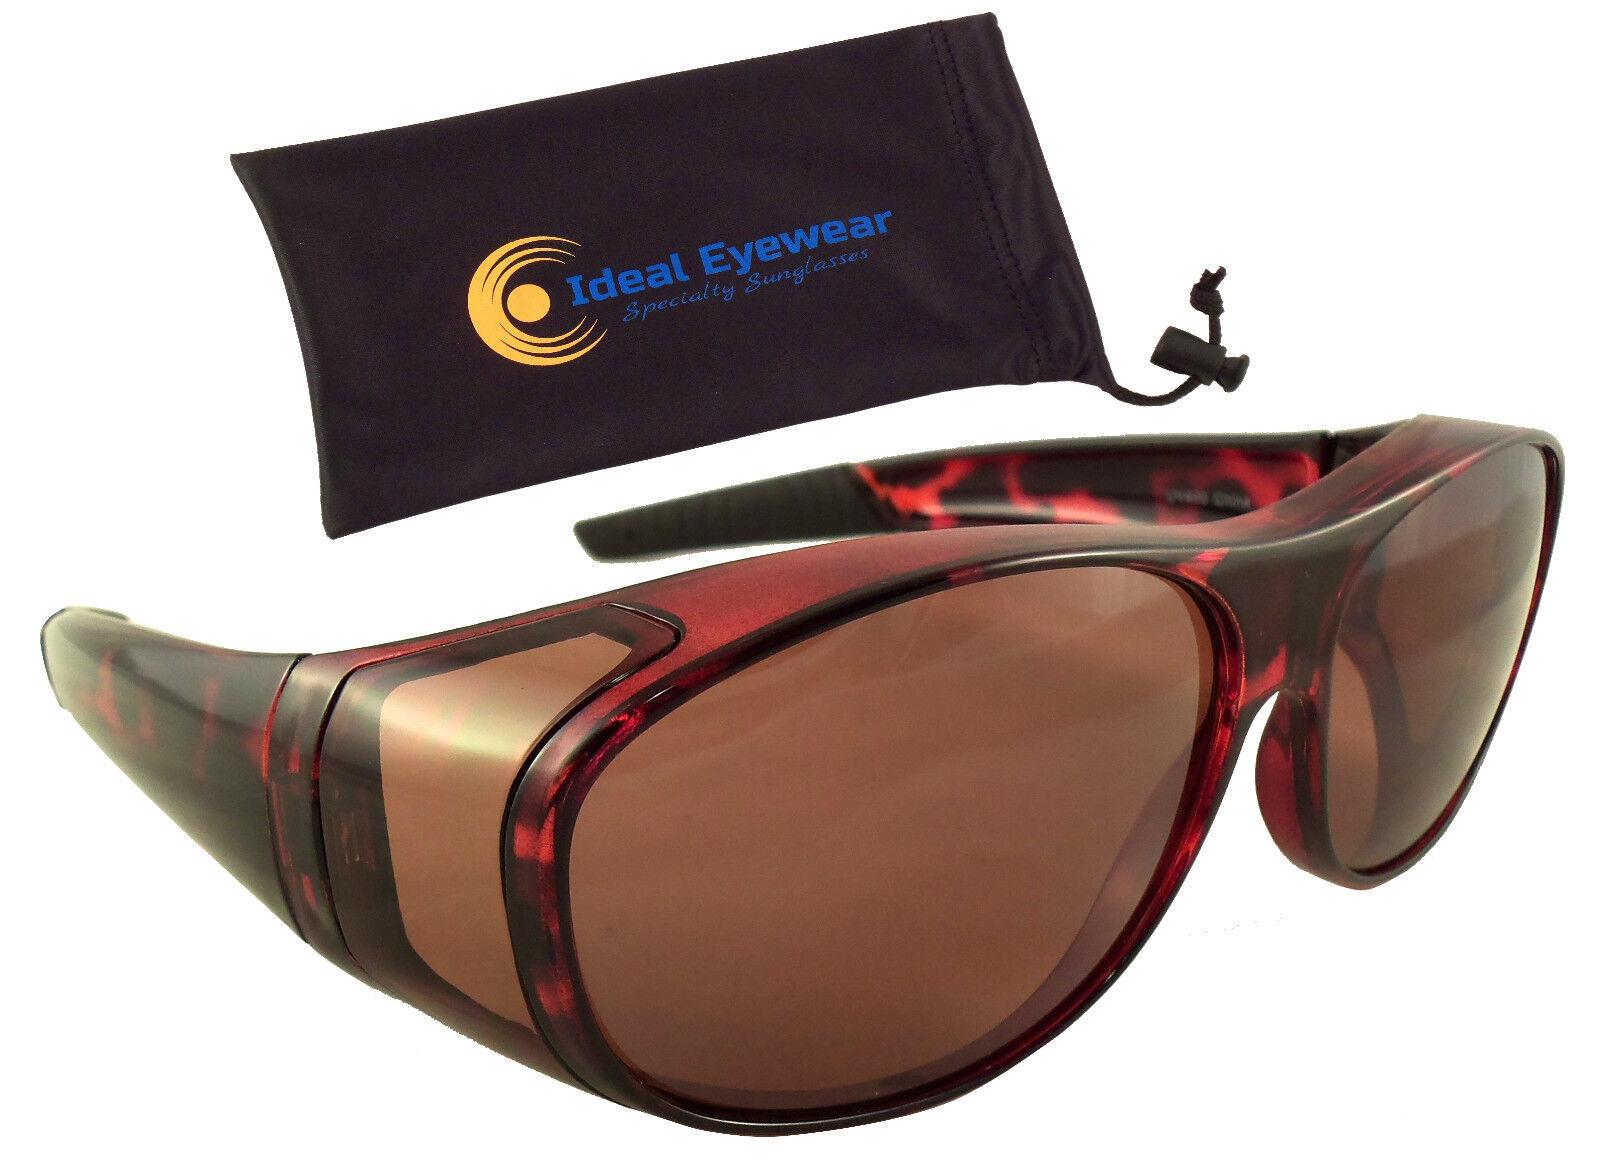 IGnaef Fit Over Glasses Sunglasses HD Polarized Lenses Wrap Around Sunglasses Wear Over Regular Glasses UV Protection